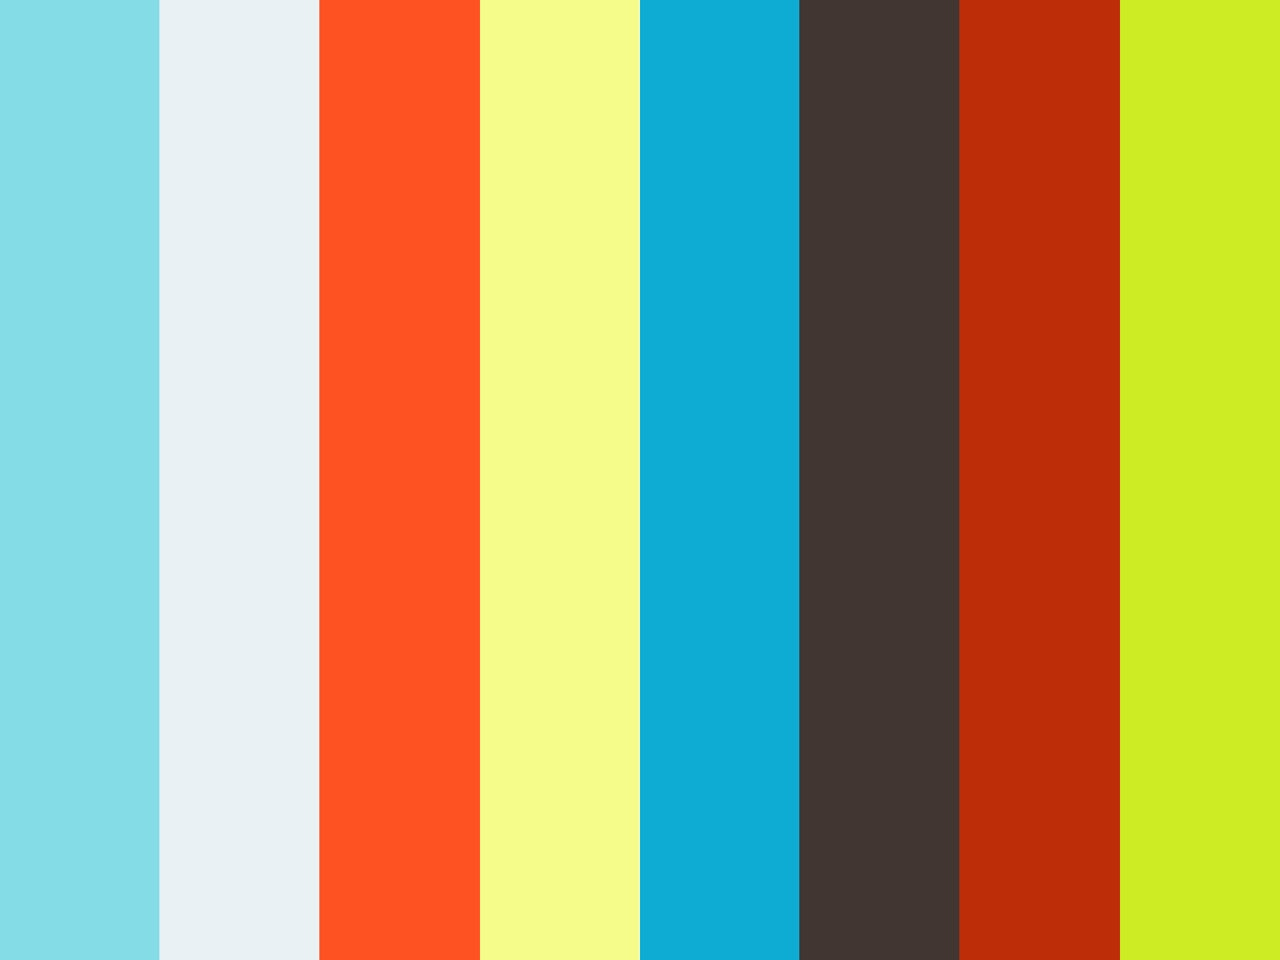 002837 - TV Provincie - Grensoverschrijdende tewerkstelling